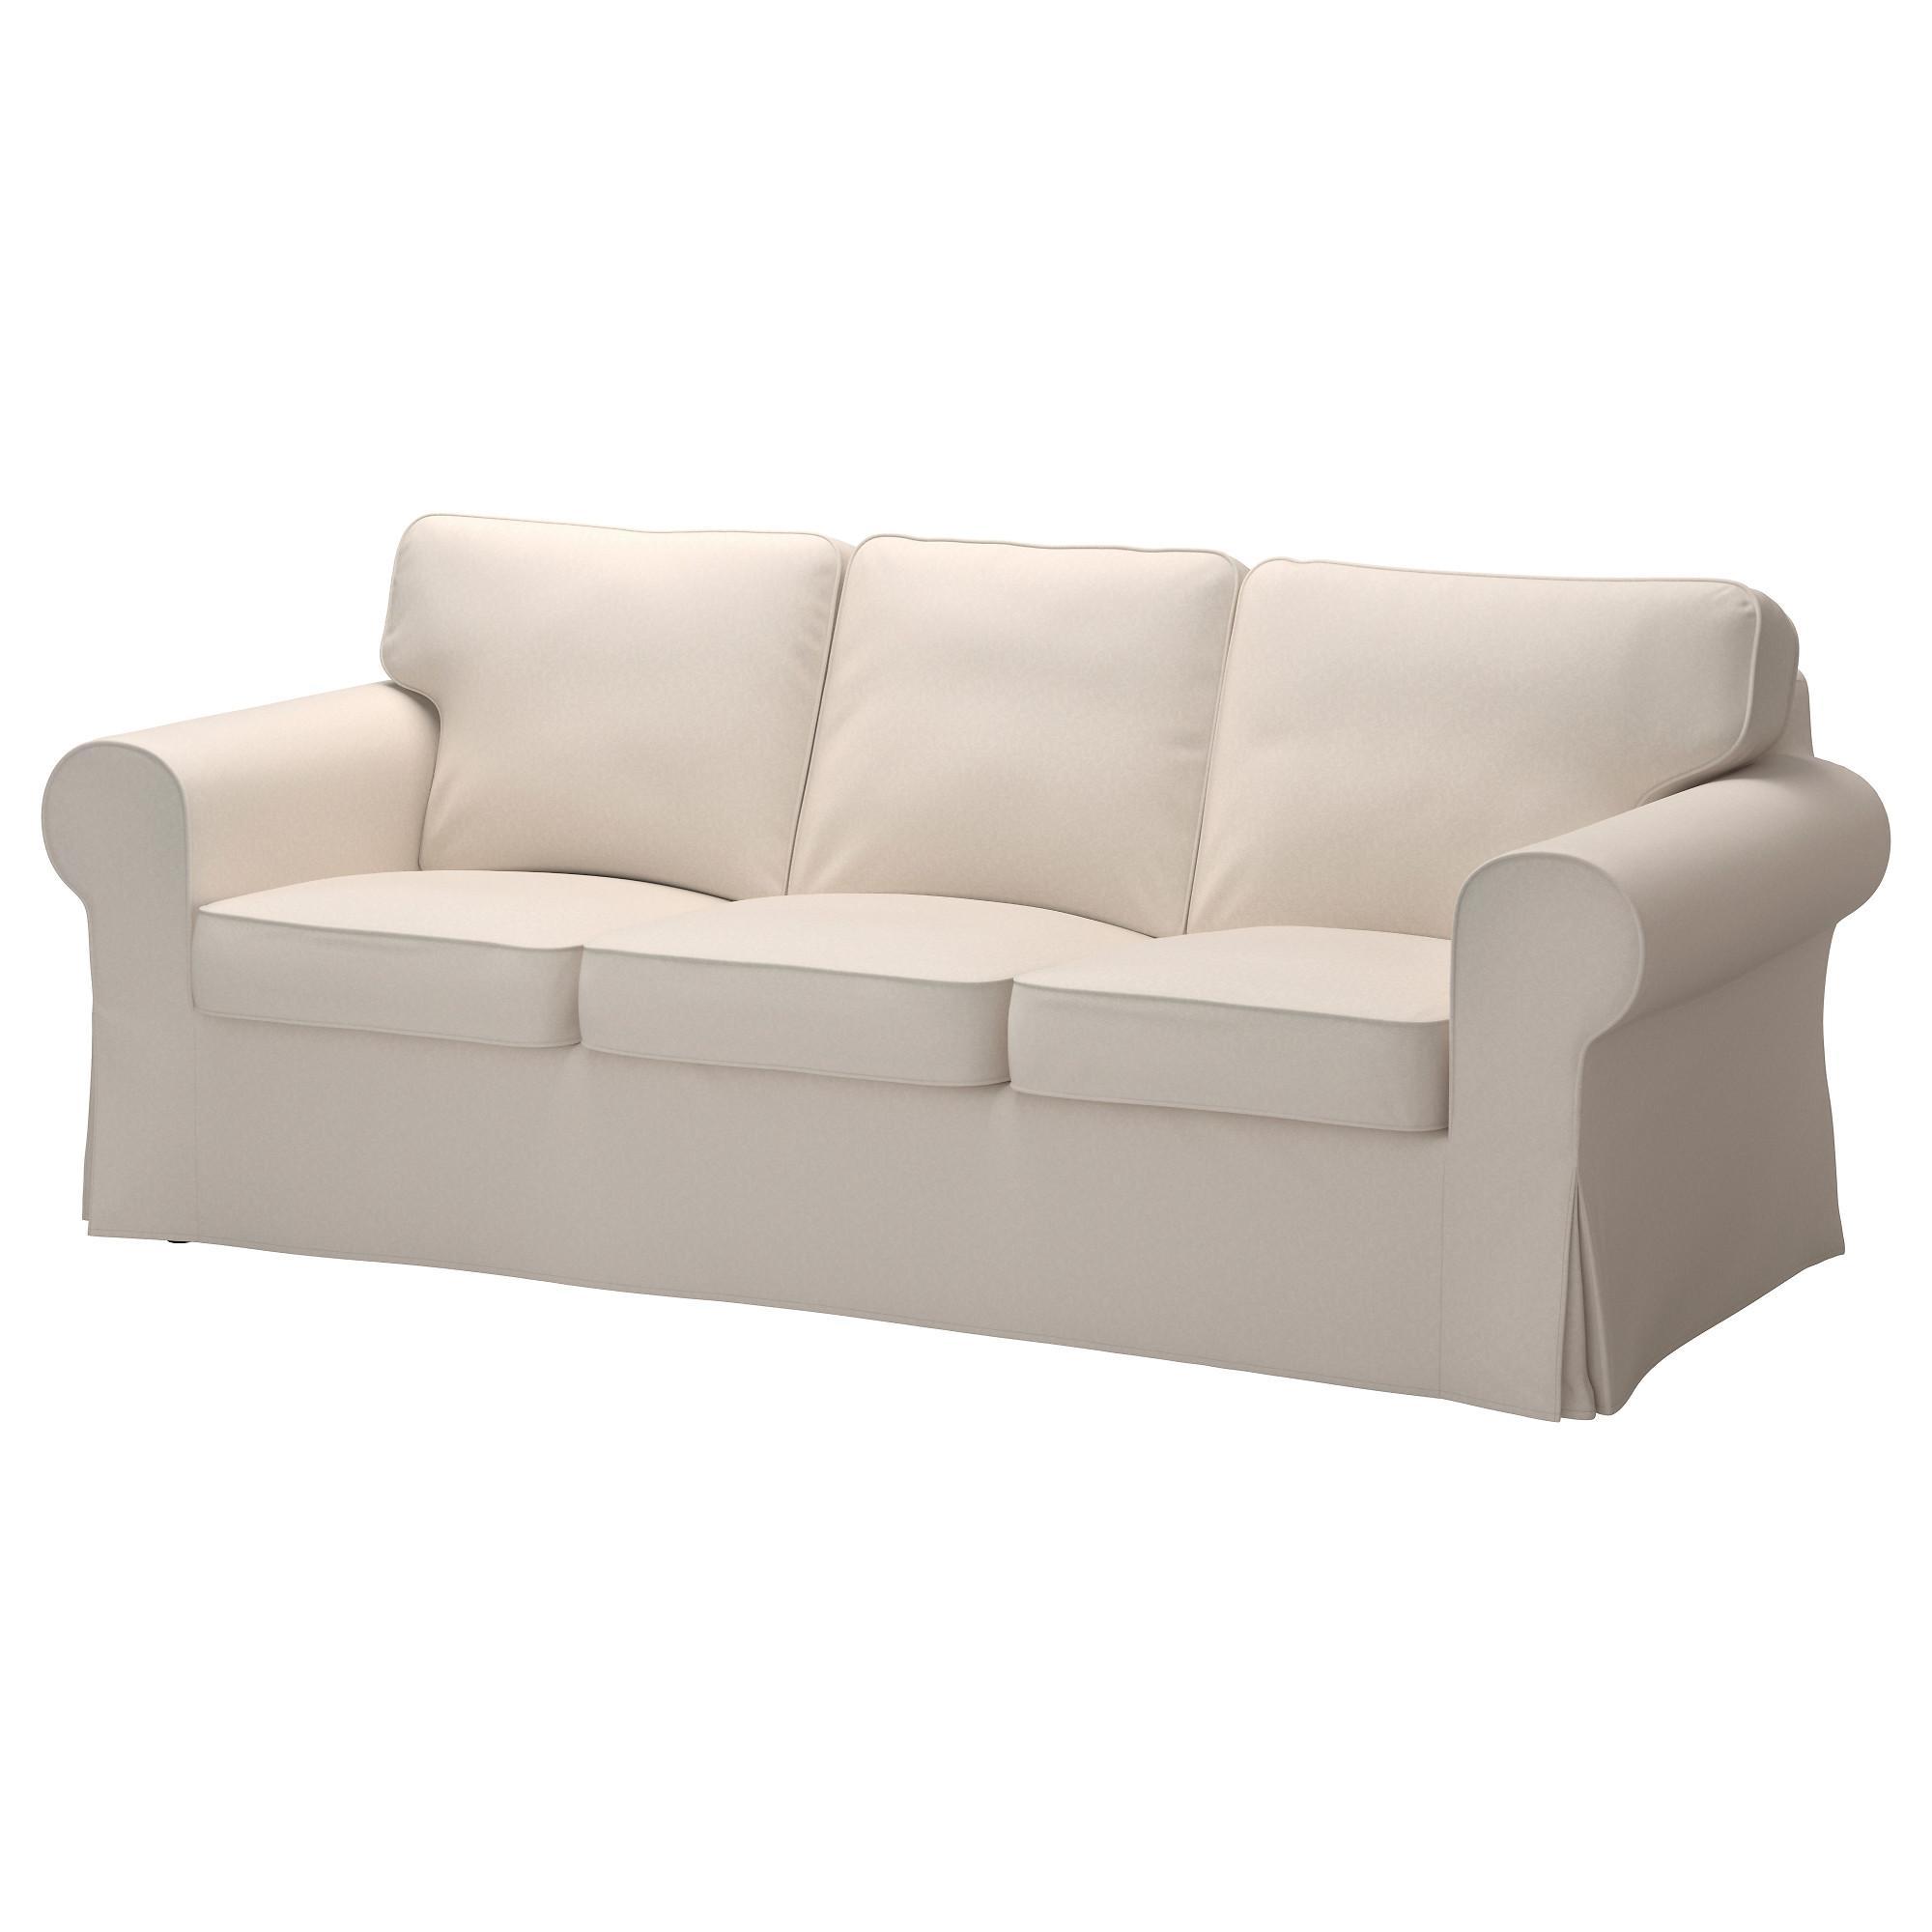 Fabric Sofas – Modern & Contemporary – Ikea Regarding Contemporary Fabric Sofas (Image 11 of 20)